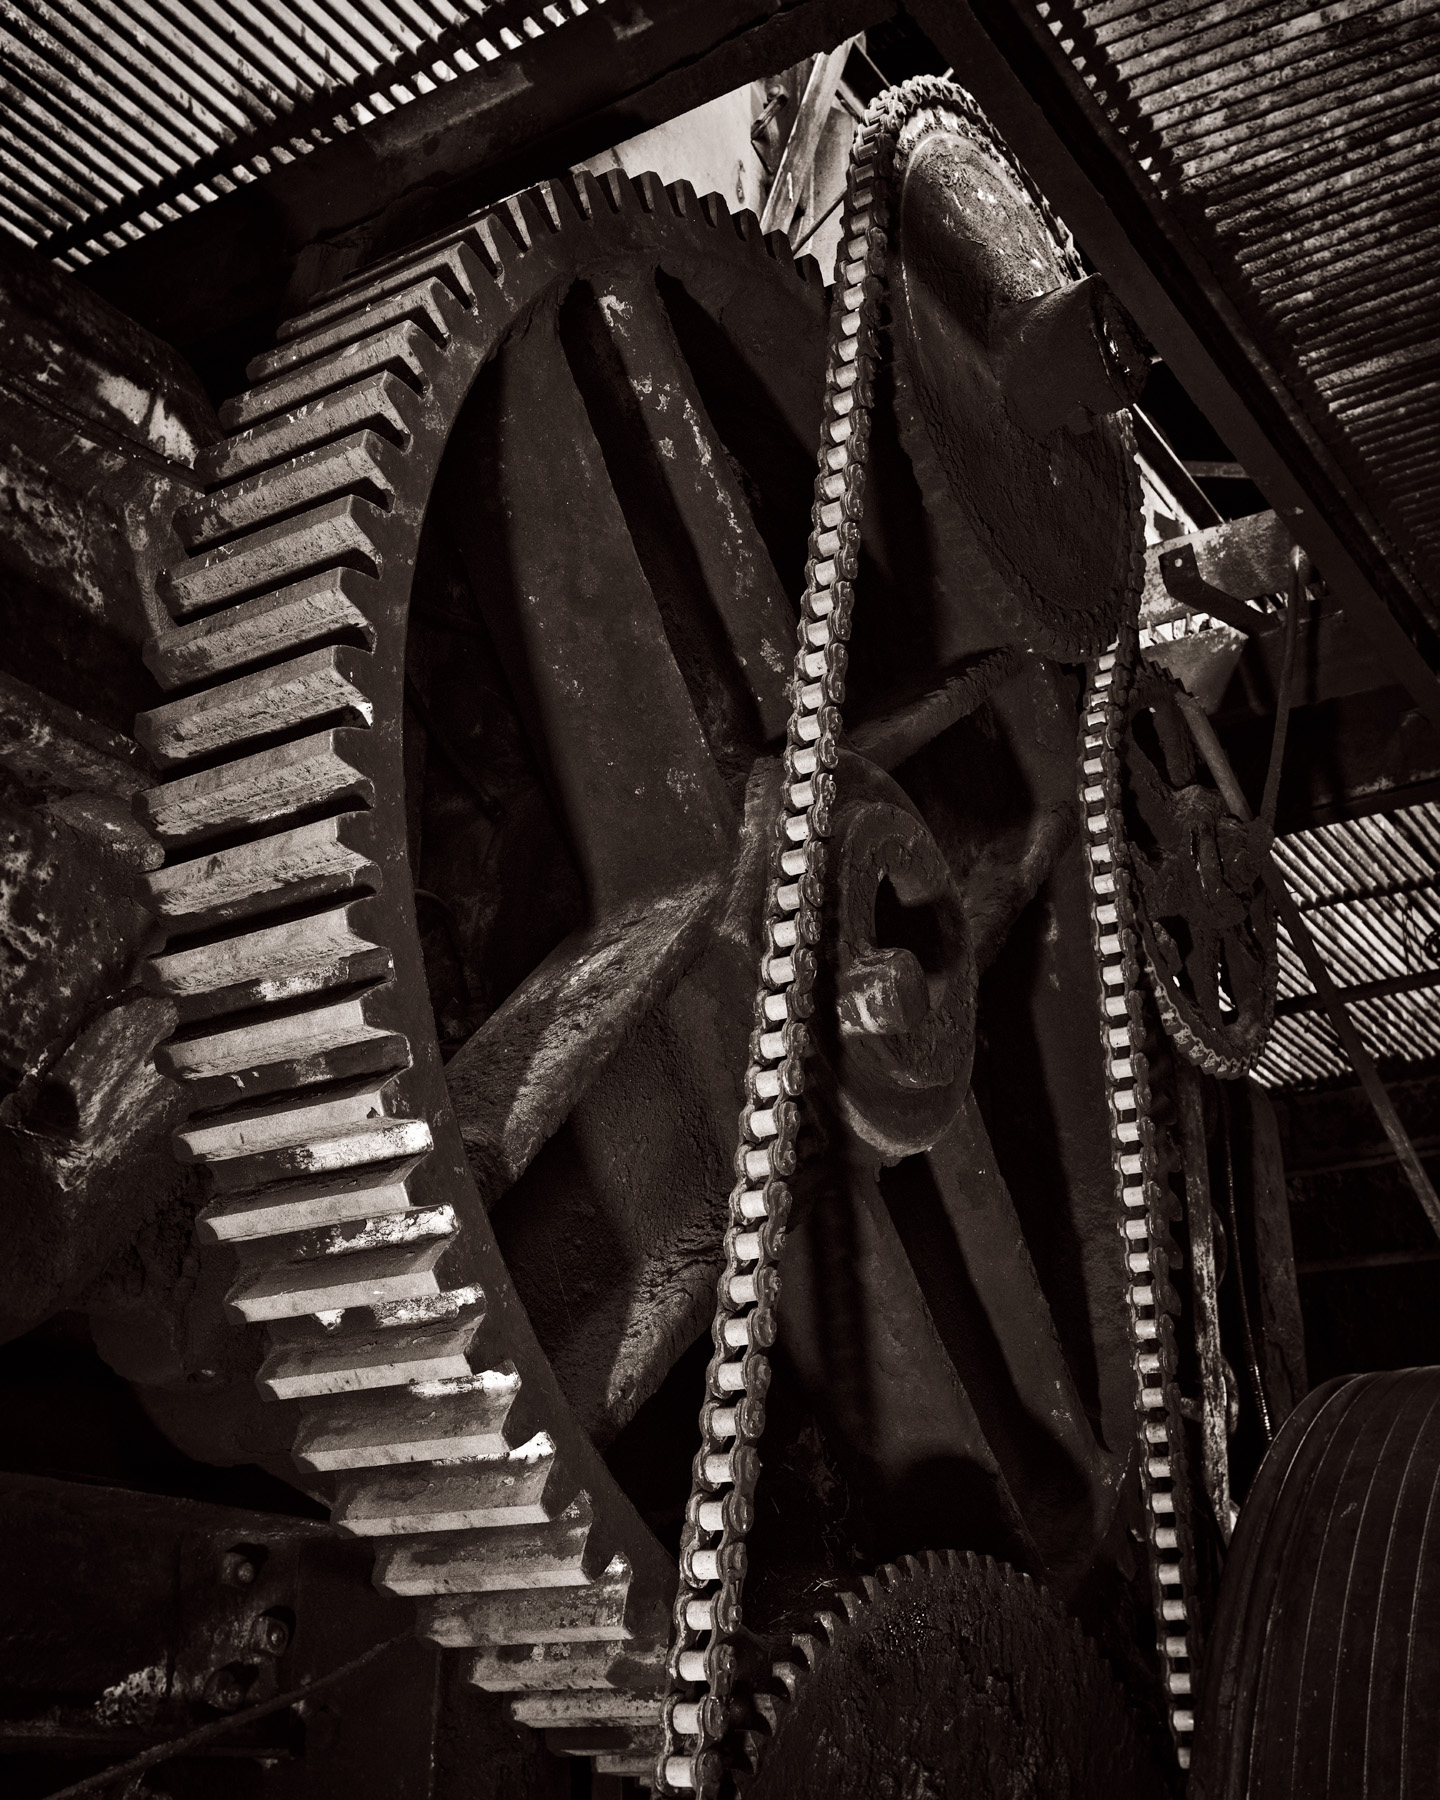 Chaining Gears, Nordegg